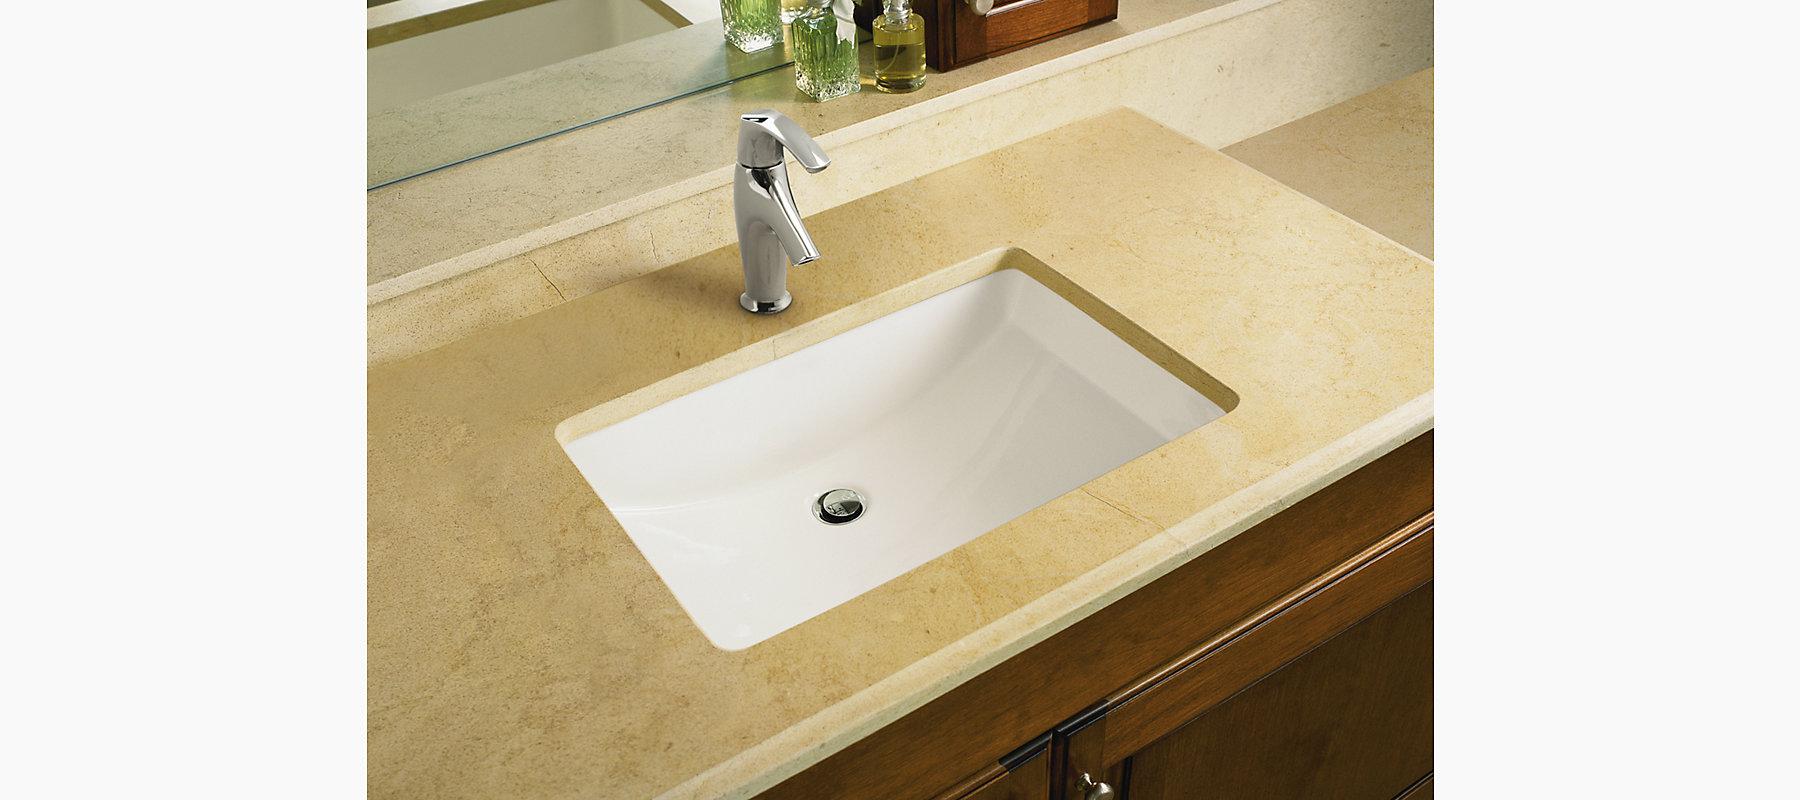 Kohler K 2215 0 Ladena Undercounter Lavatory Sink White